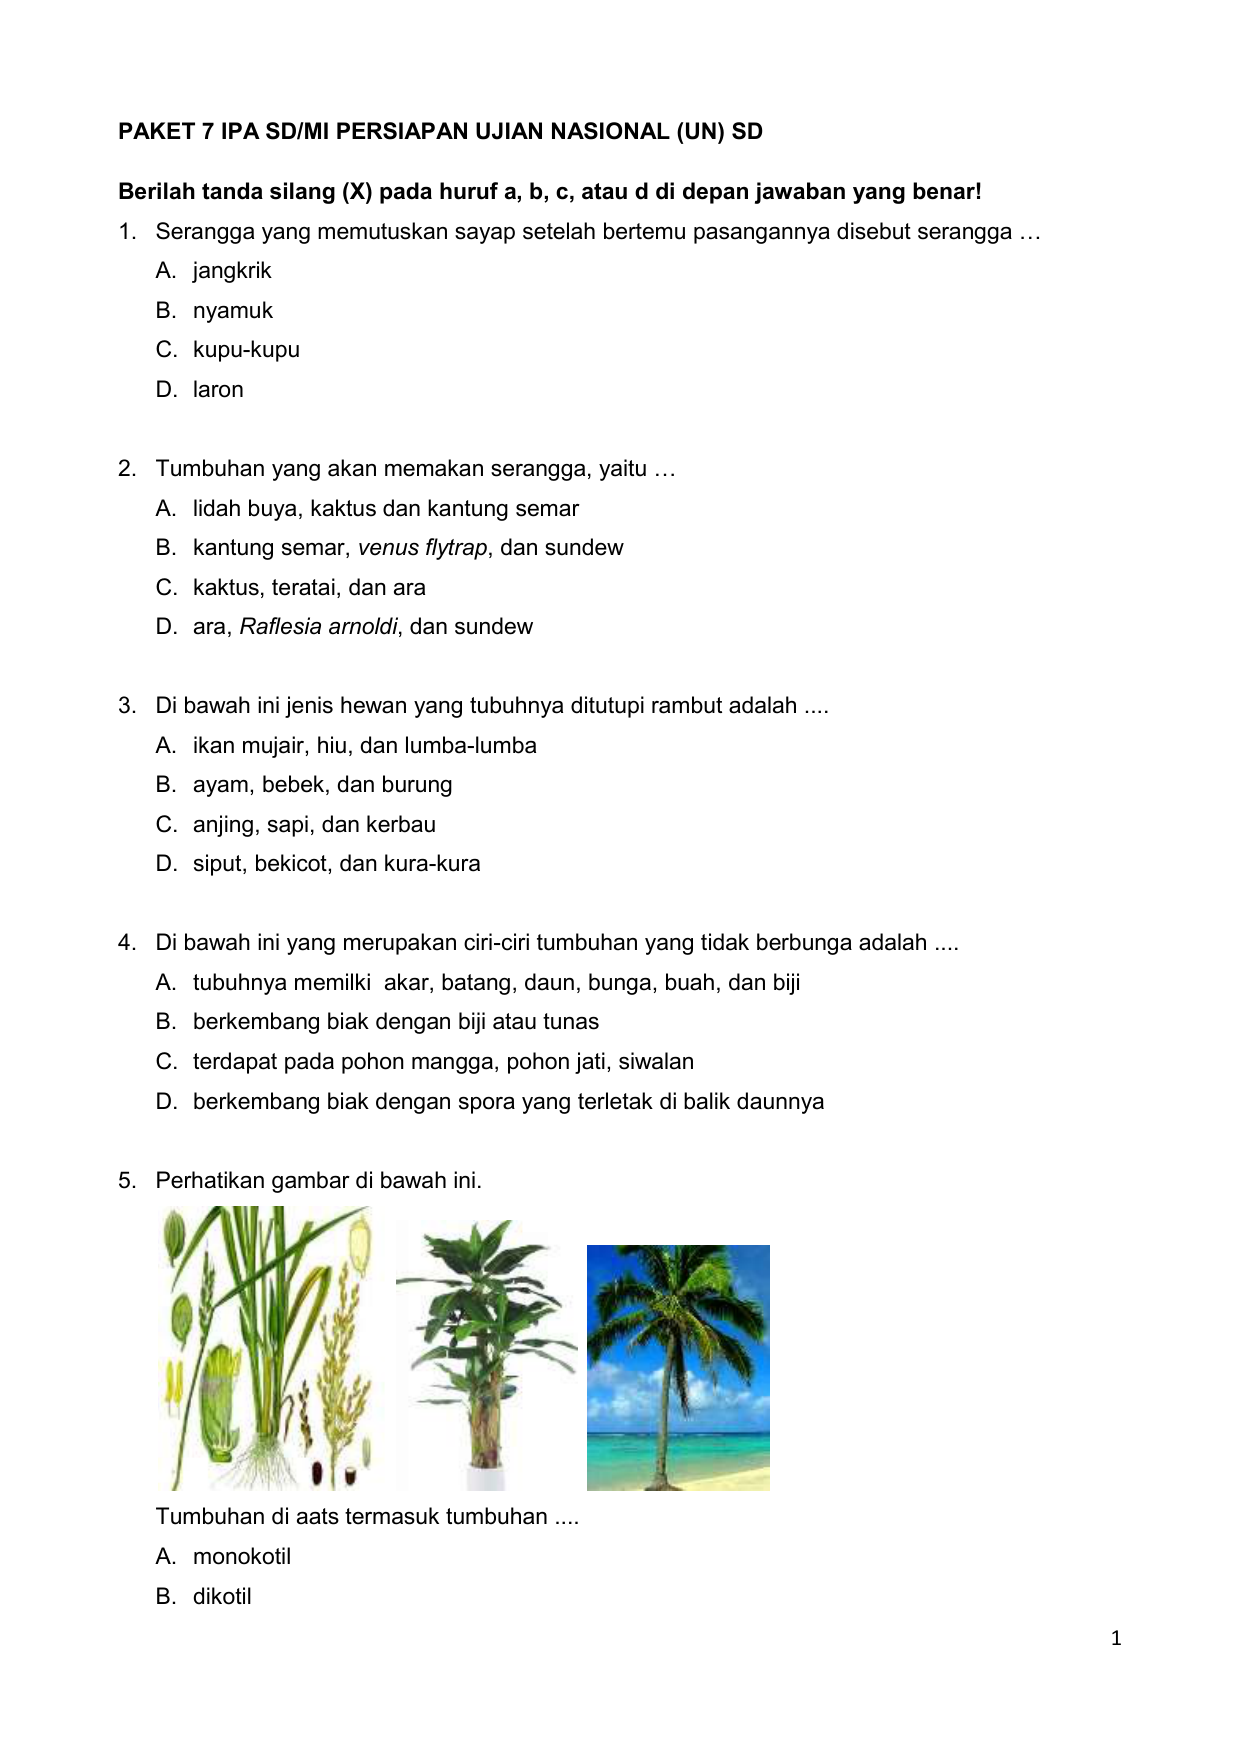 Download 60 Gambar Bunga Raflesia Dan Ciri Cirinya Paling Cantik HD